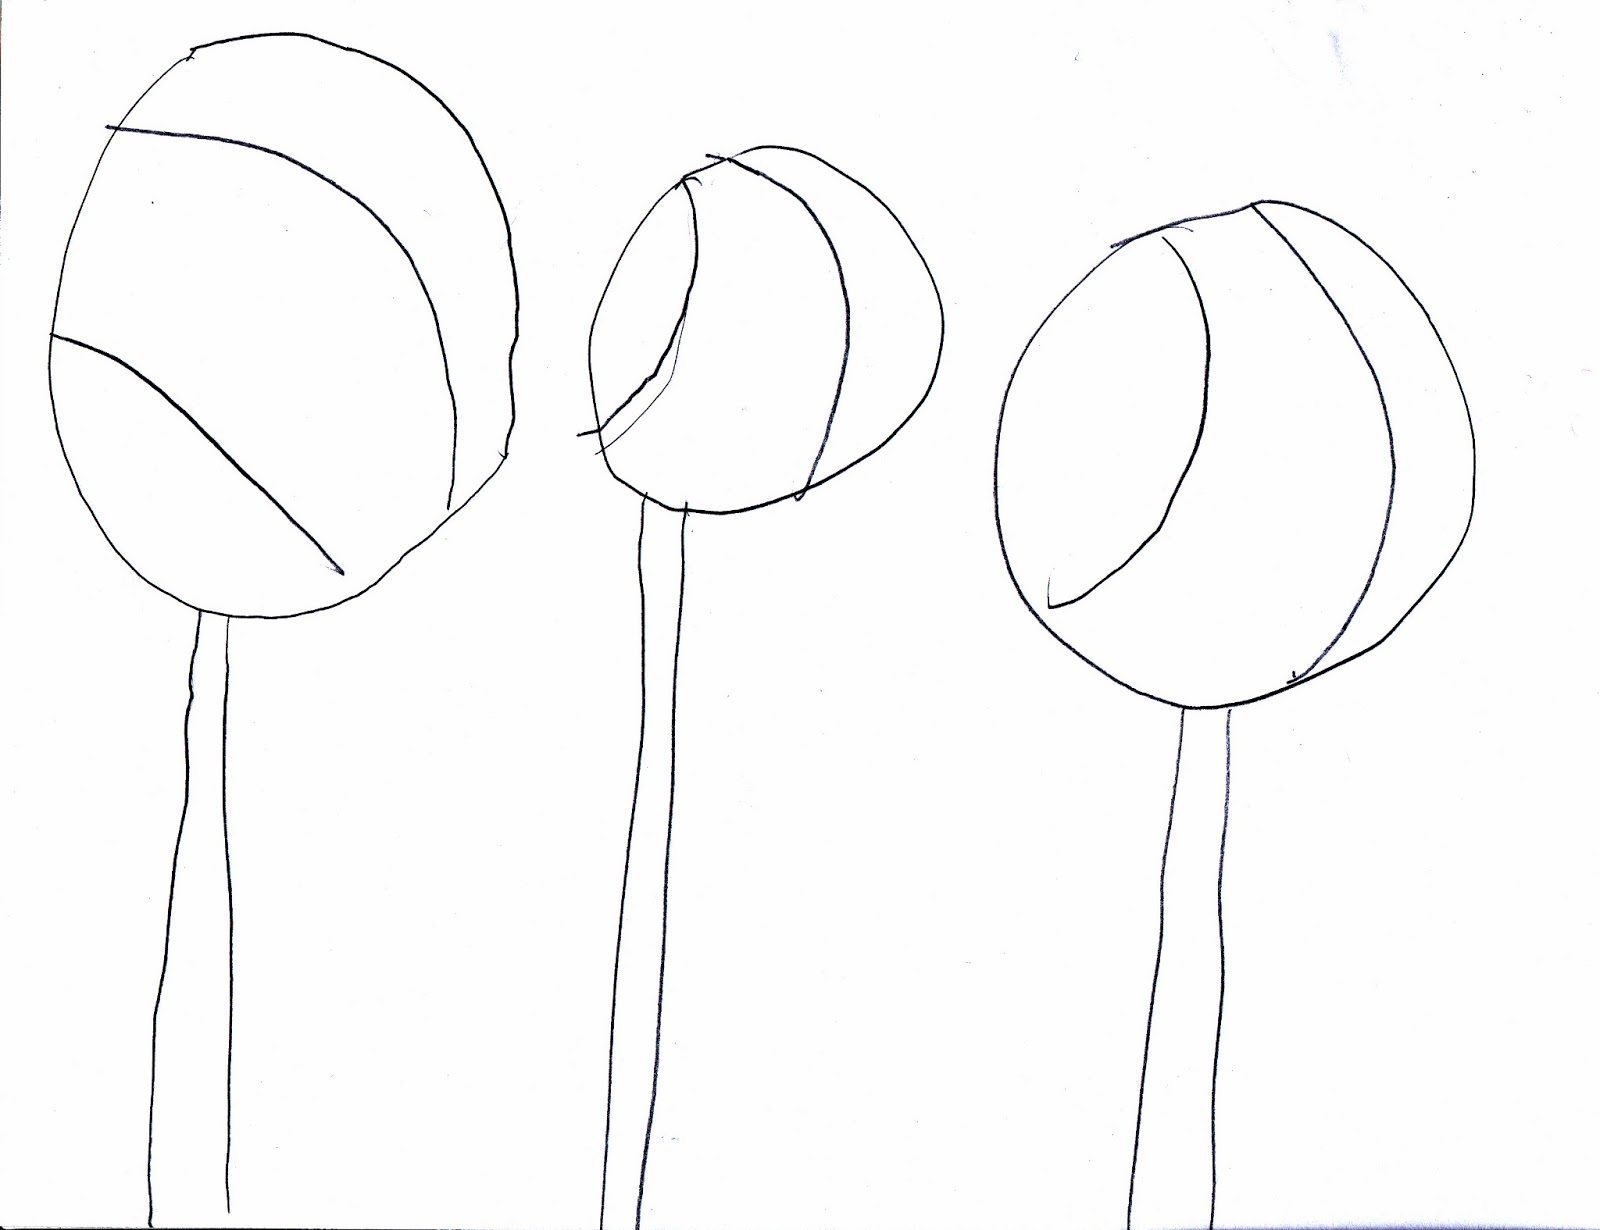 Agathas Coloring Pages Lollipop Coloring Page - Lollipop-coloring-page